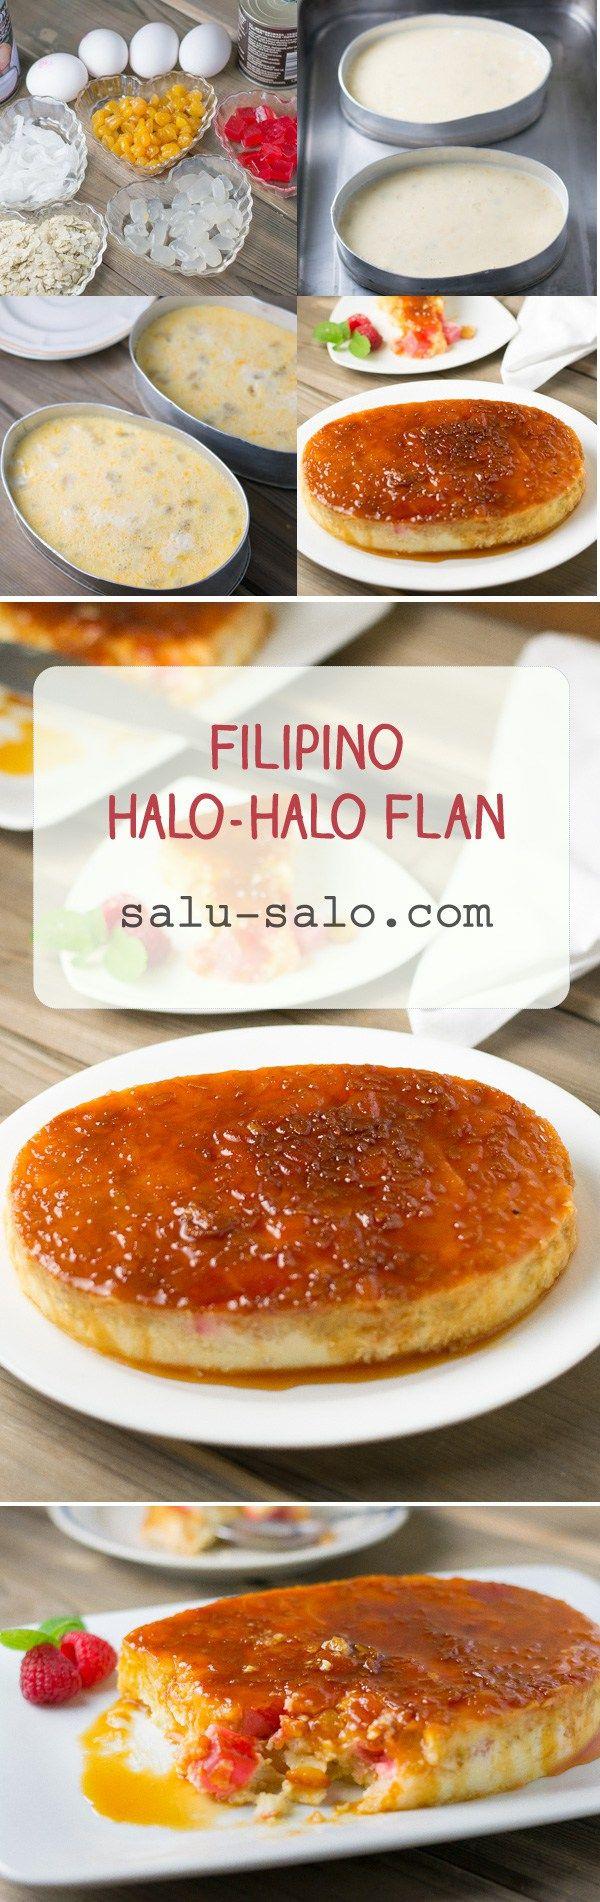 1233 best filipino food images on pinterest filipino recipes halo halo flan forumfinder Gallery